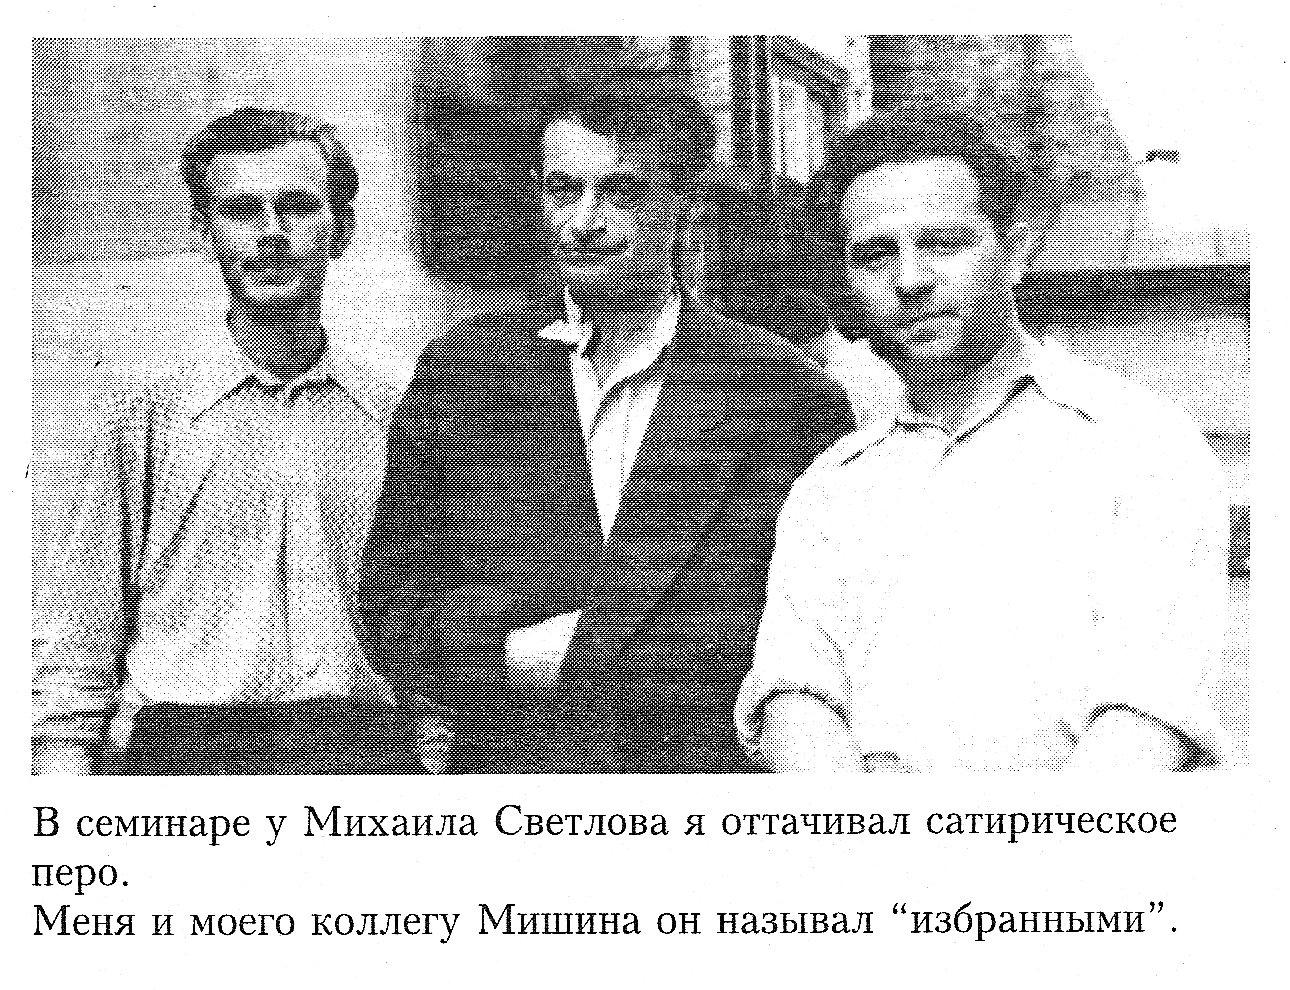 20.Михаил Светлов и Ефим Чеповецкий (справа).